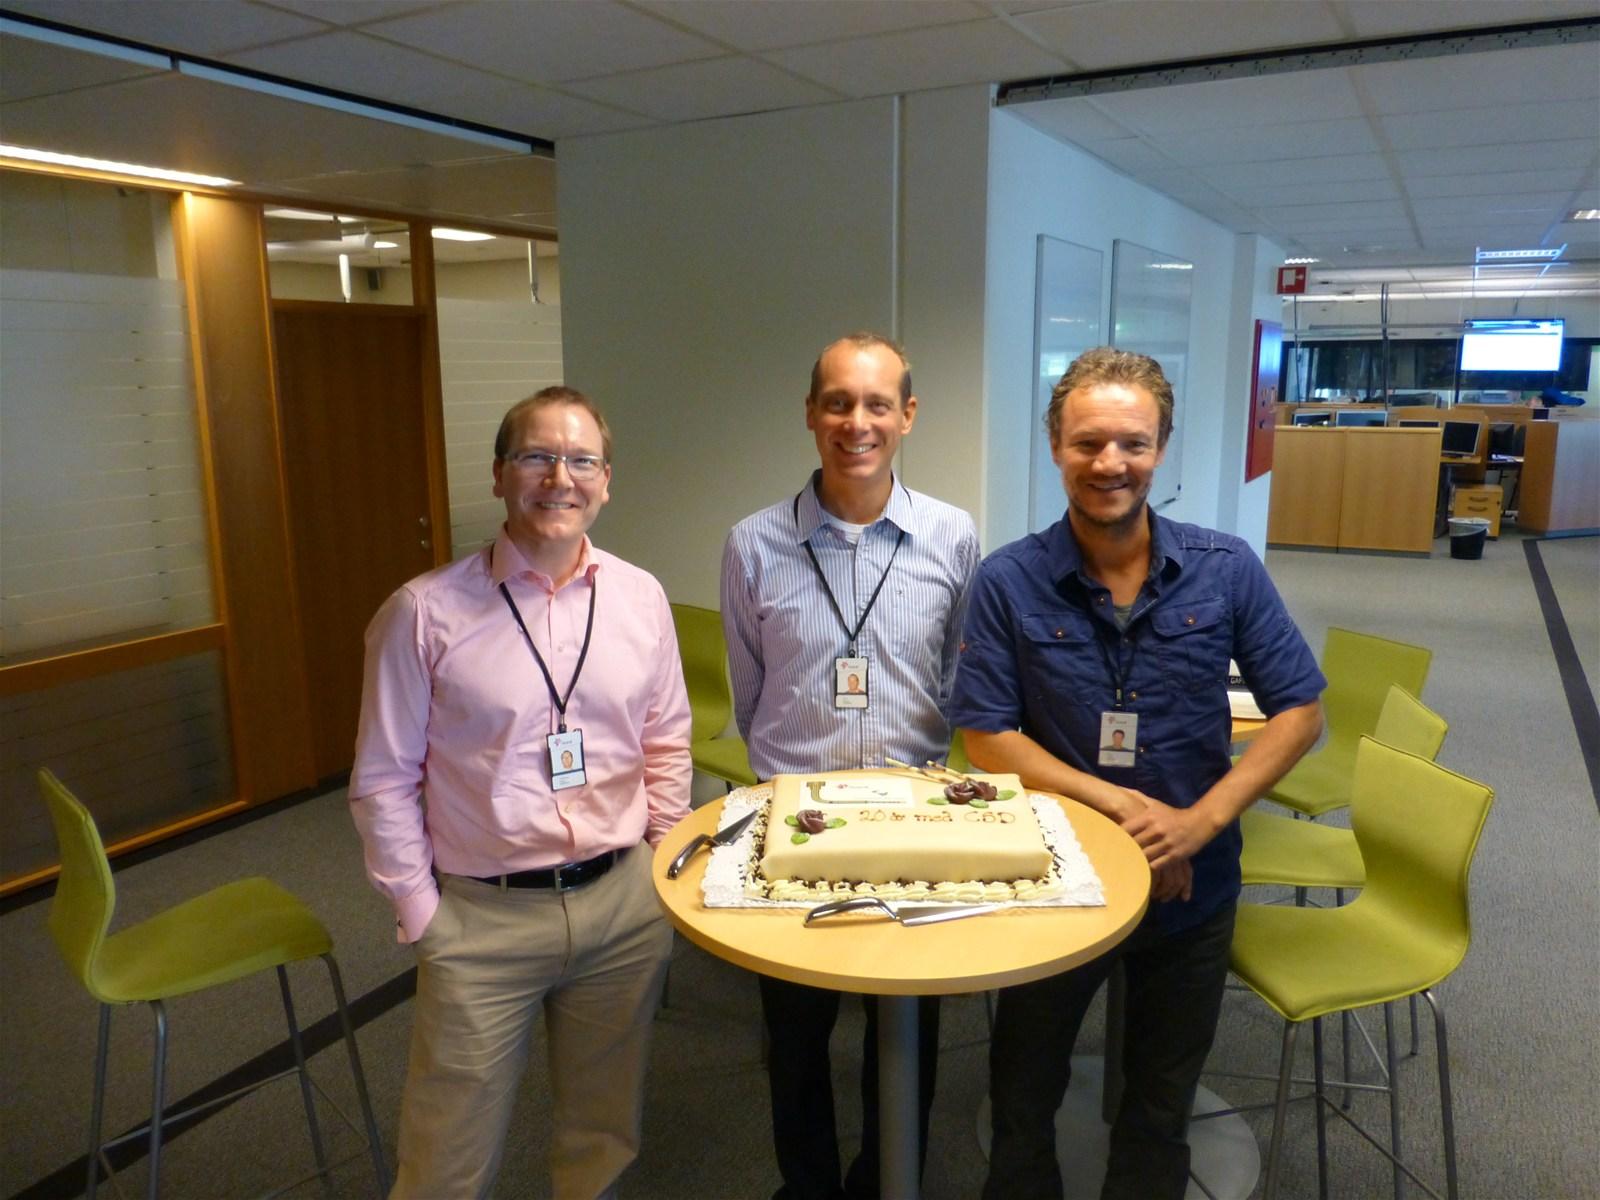 Directors Gard Karlsen, Olav Beisland and Knut Fadnes